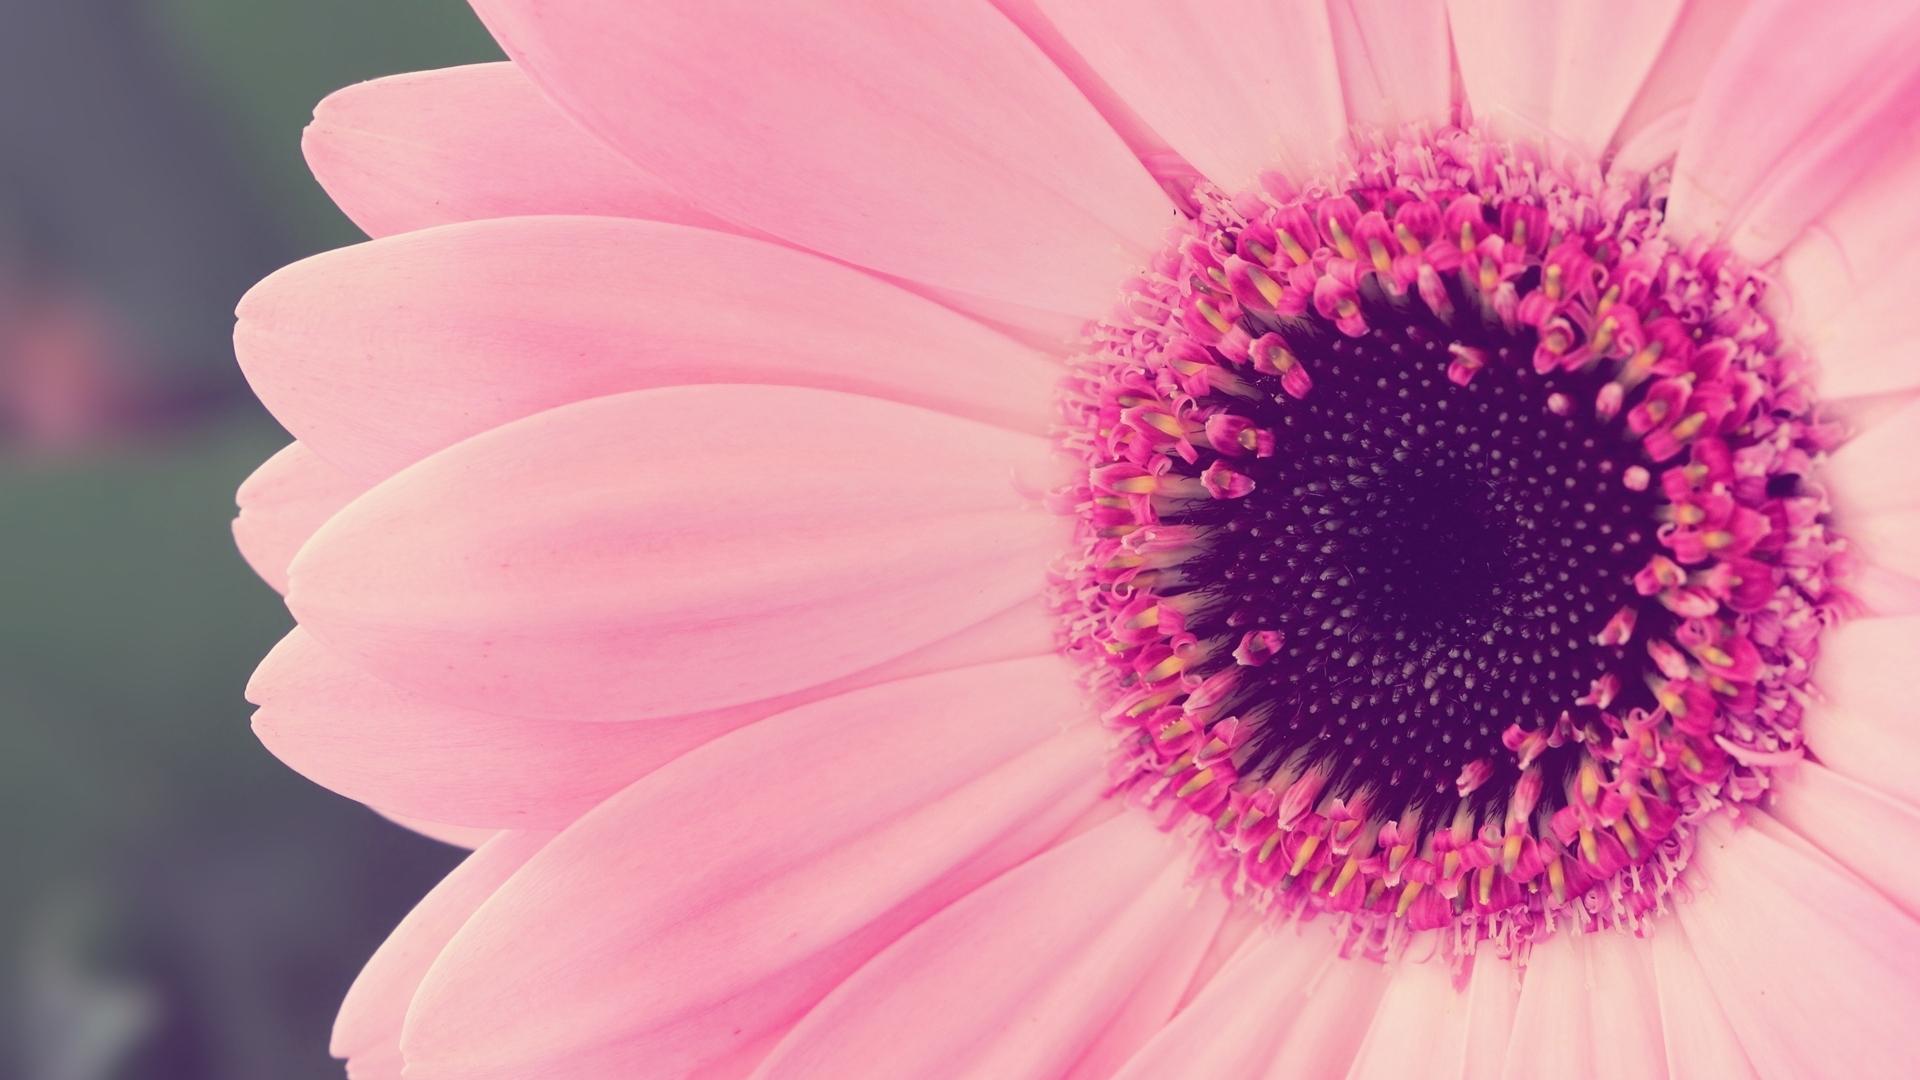 Free Download Pink Flower Desktop Wallpaper Pink Flower Hd